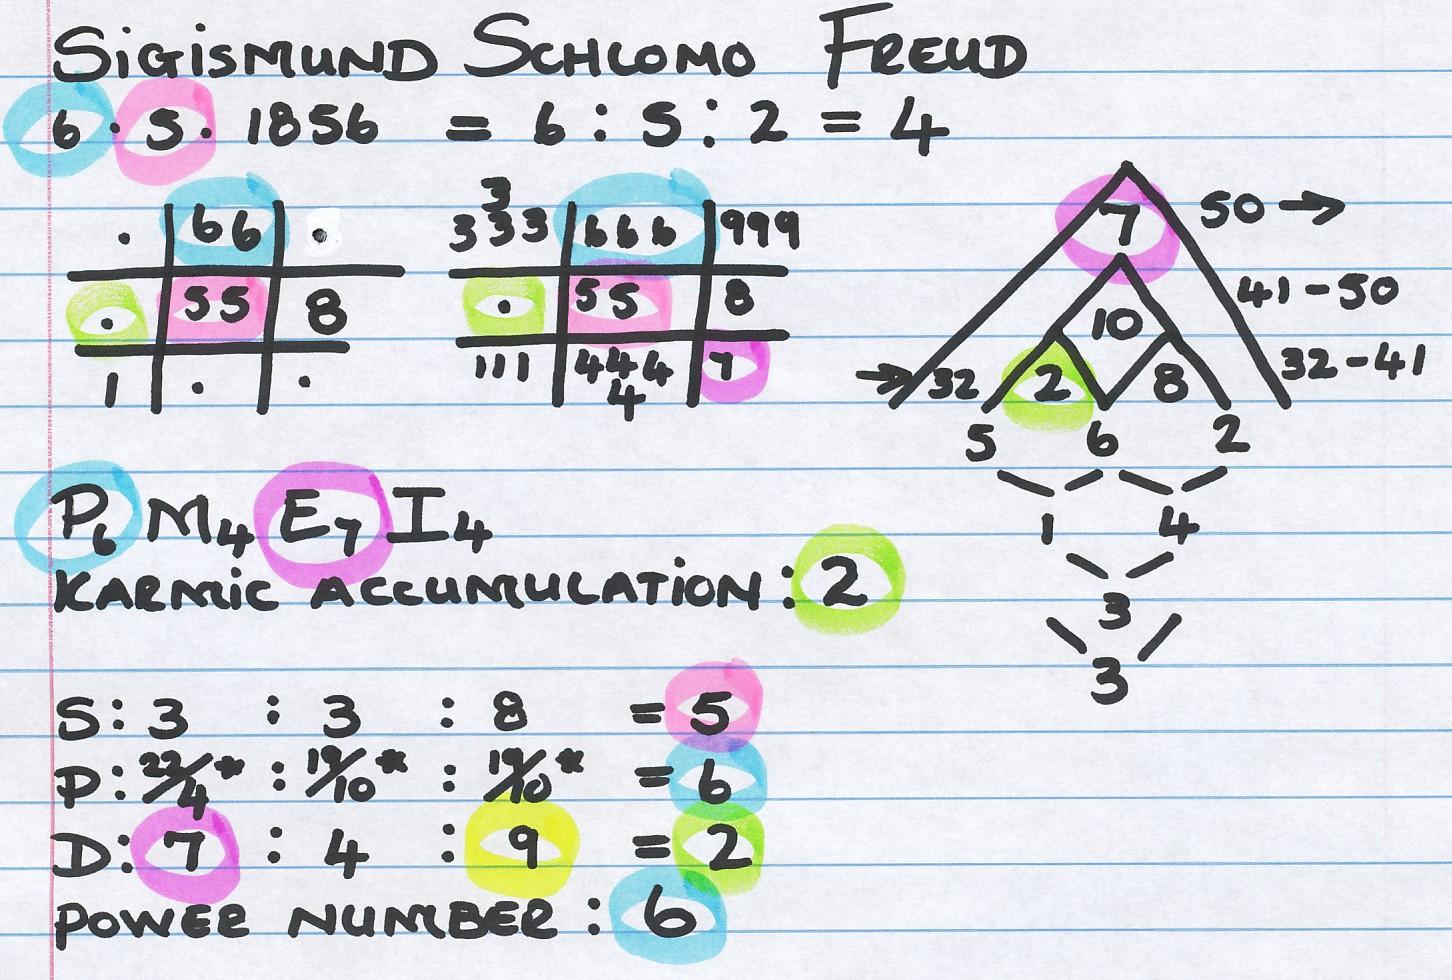 PlanetJanet-Lynn: Wacko - Freud, Jung, Watson and Wundt numerology